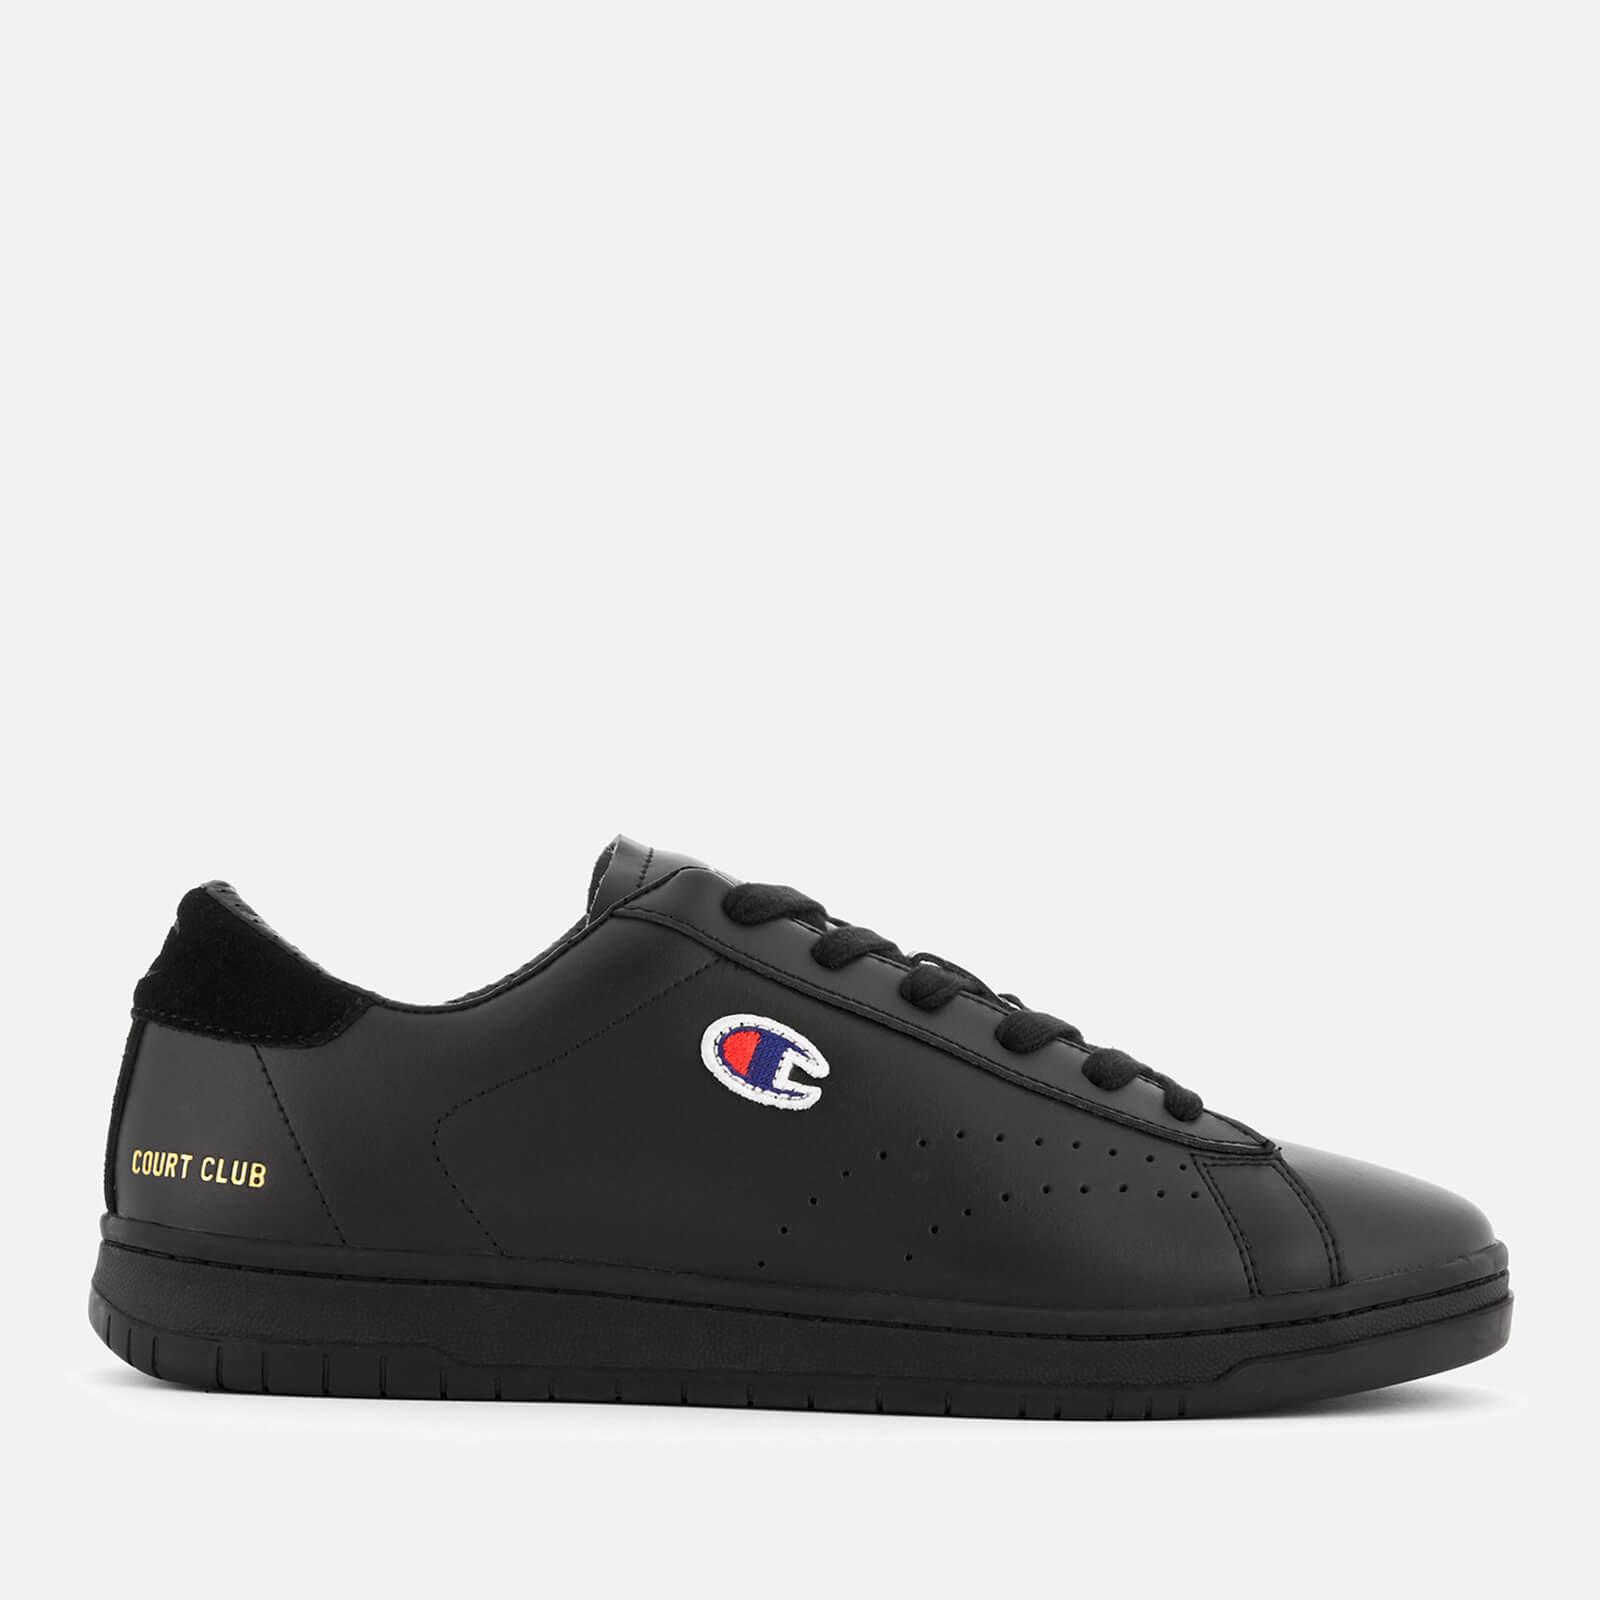 a9169b0a8b2 Champion Men s Court Club Trainers - Black Mens Footwear